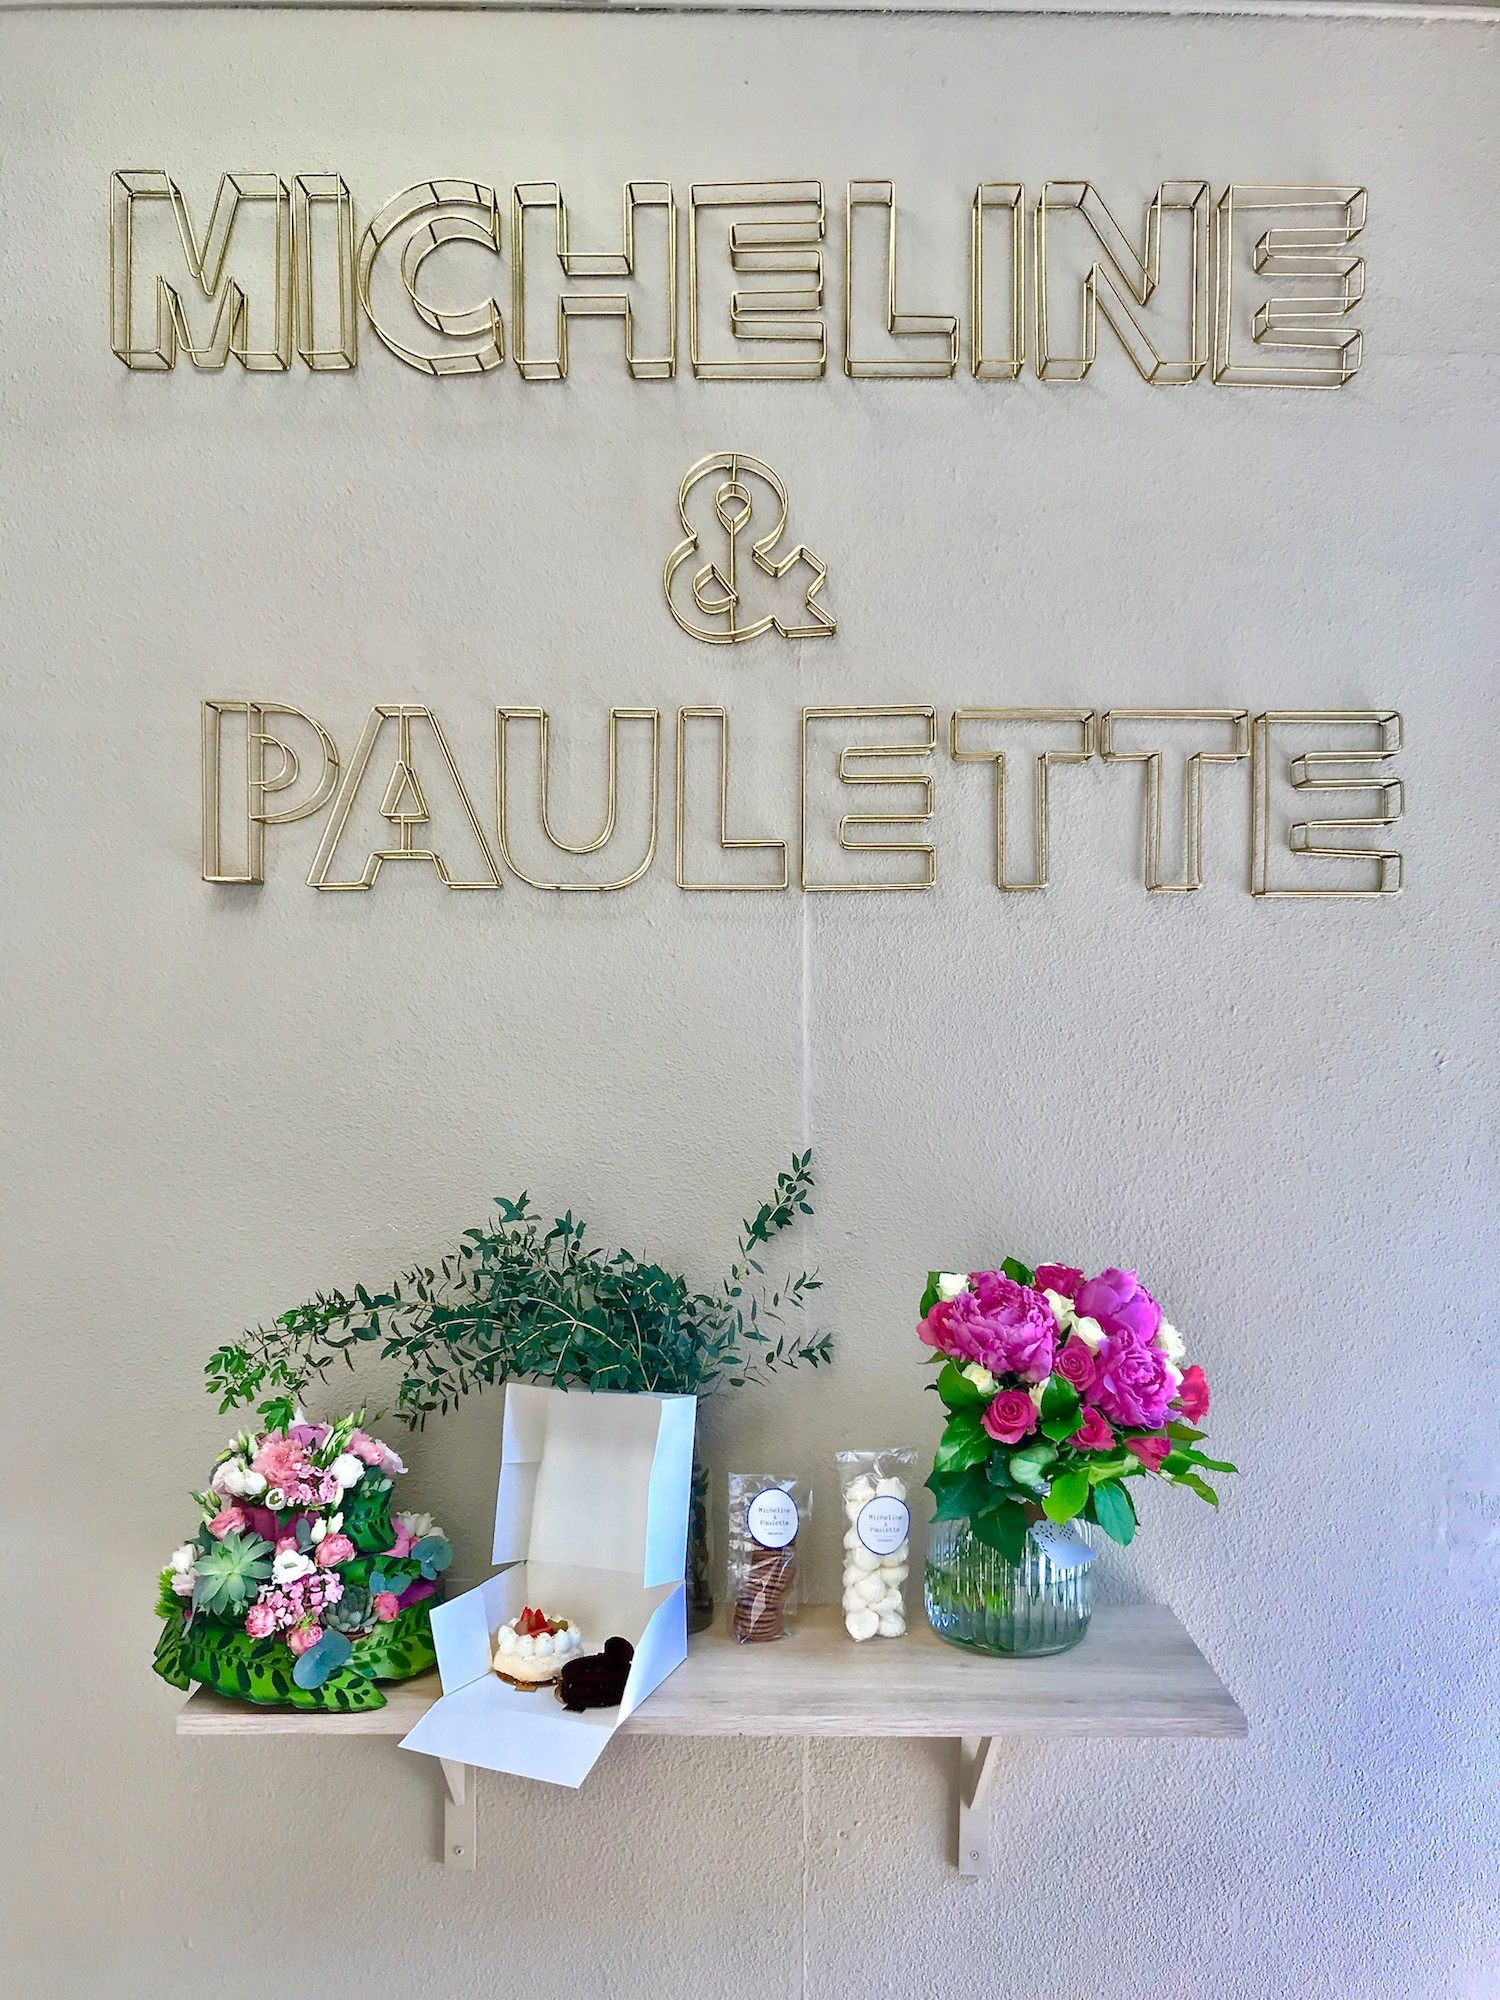 MICHELINE & PAULETTE